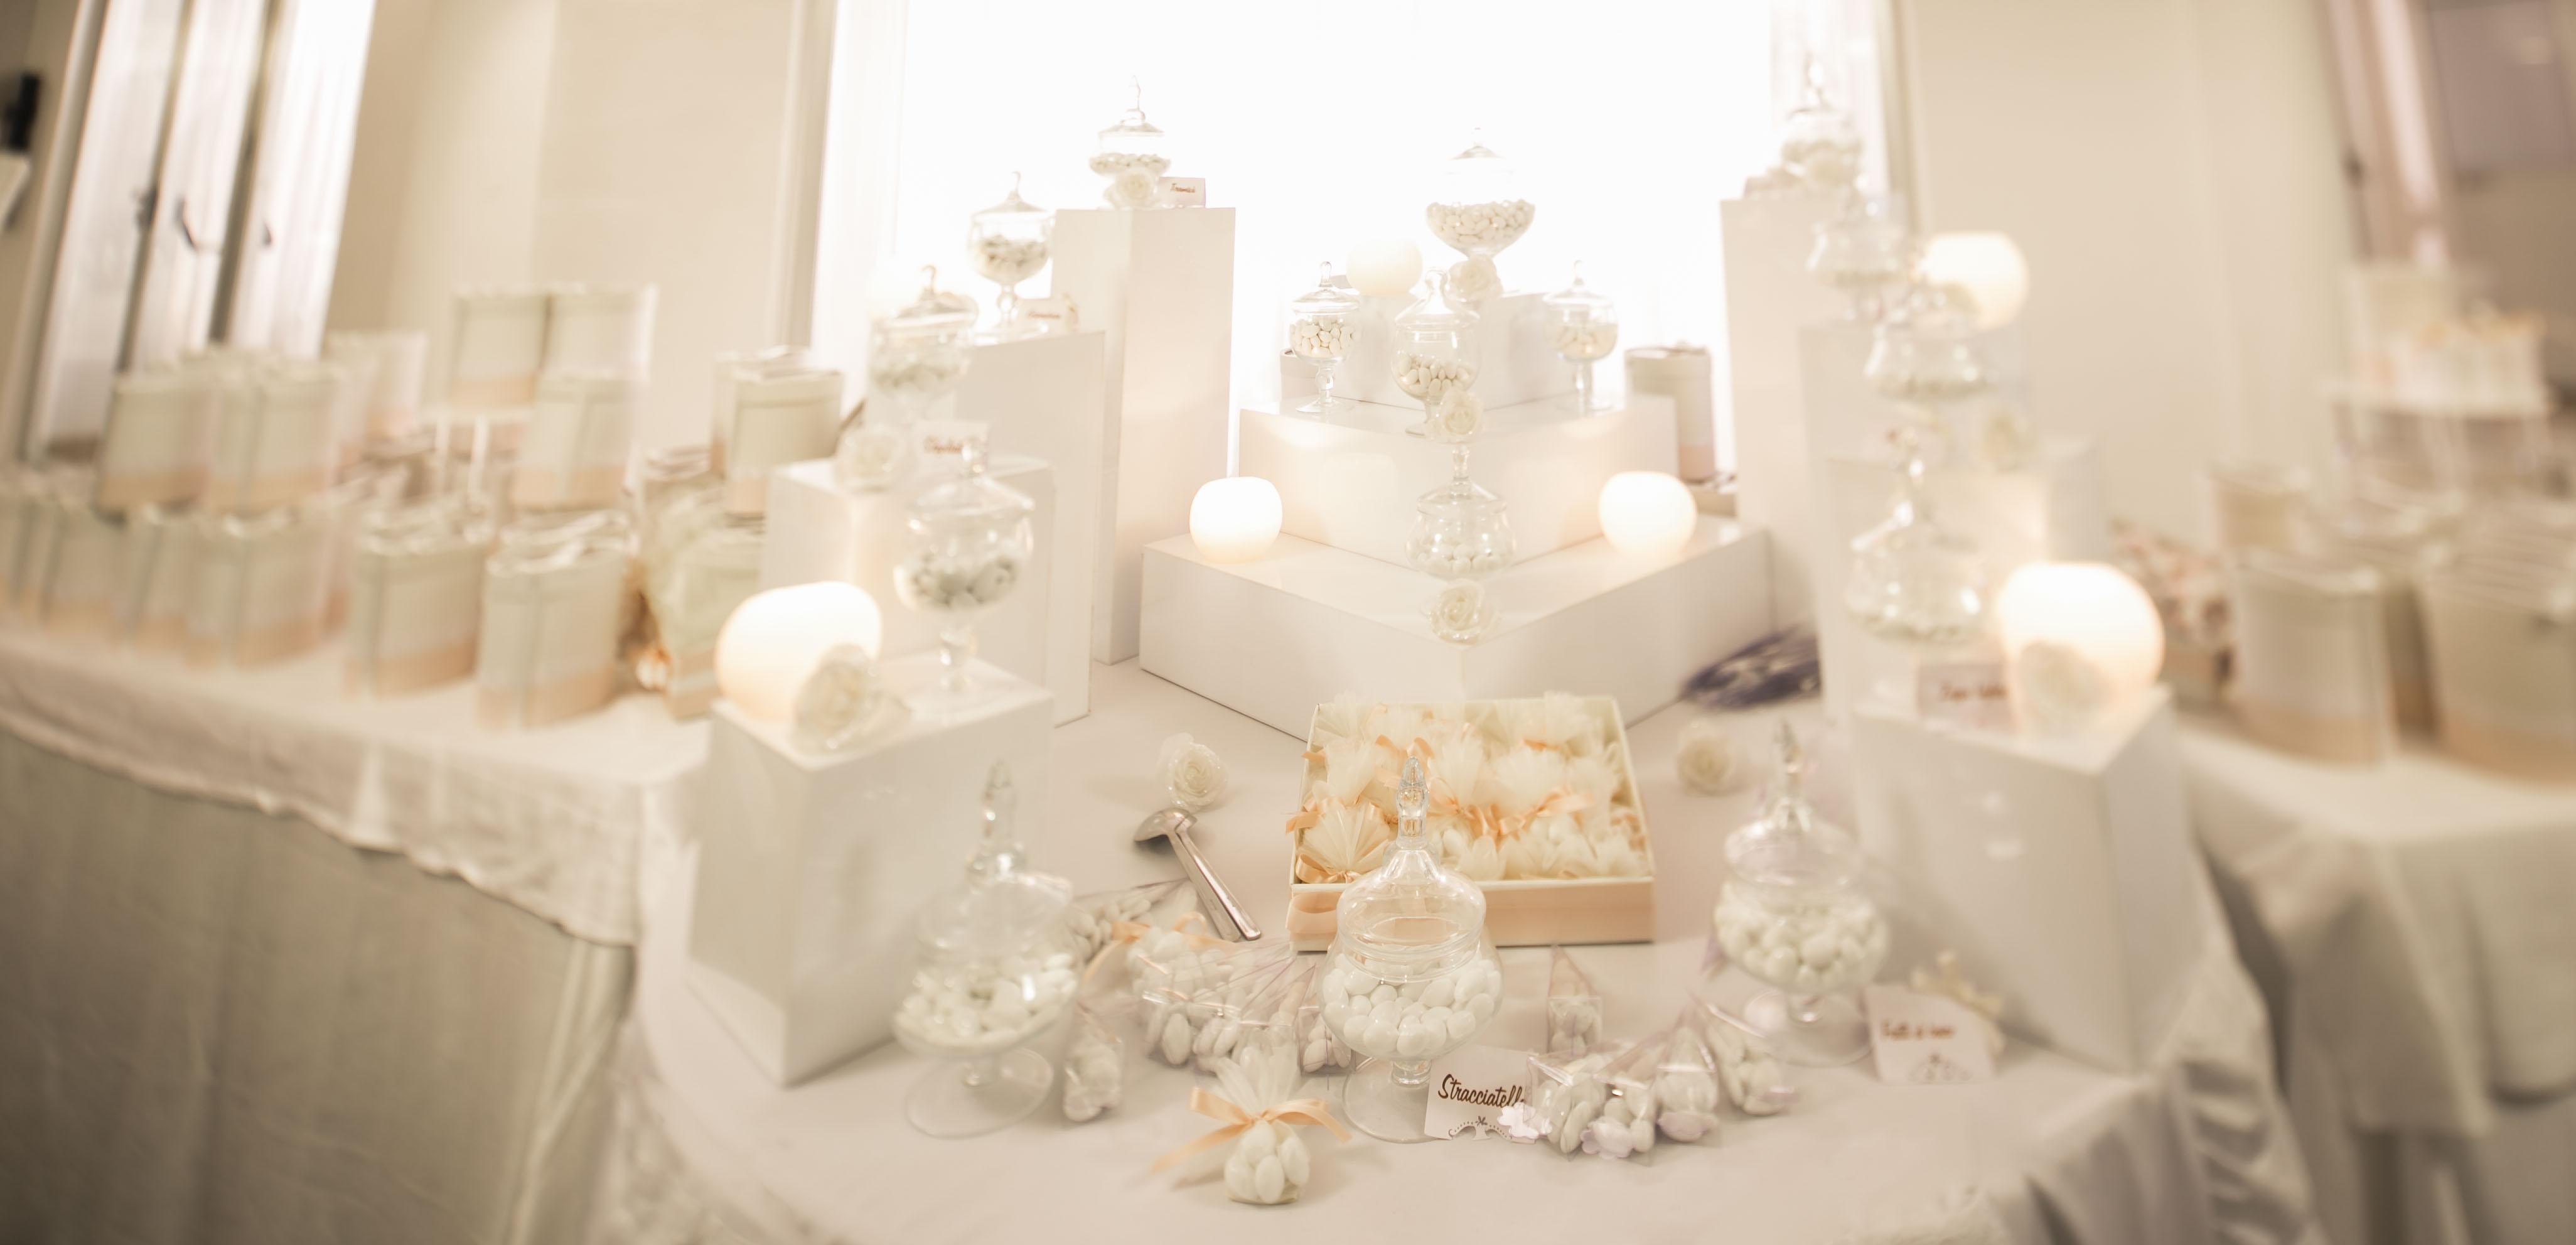 Tema Per Un Matrimonio Elegante : Confettata luminosa ed elegante di un matrimonio in